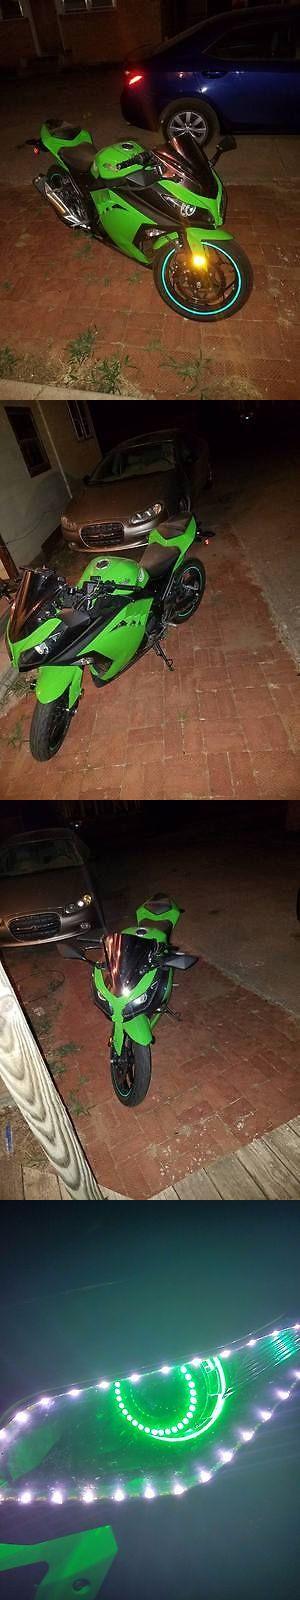 Motorcycles: 2015 Kawasaki Ninja 2015 Kawasaki Ninja 300 (Customized, Used Great Condition) -> BUY IT NOW ONLY: $4200 on eBay!